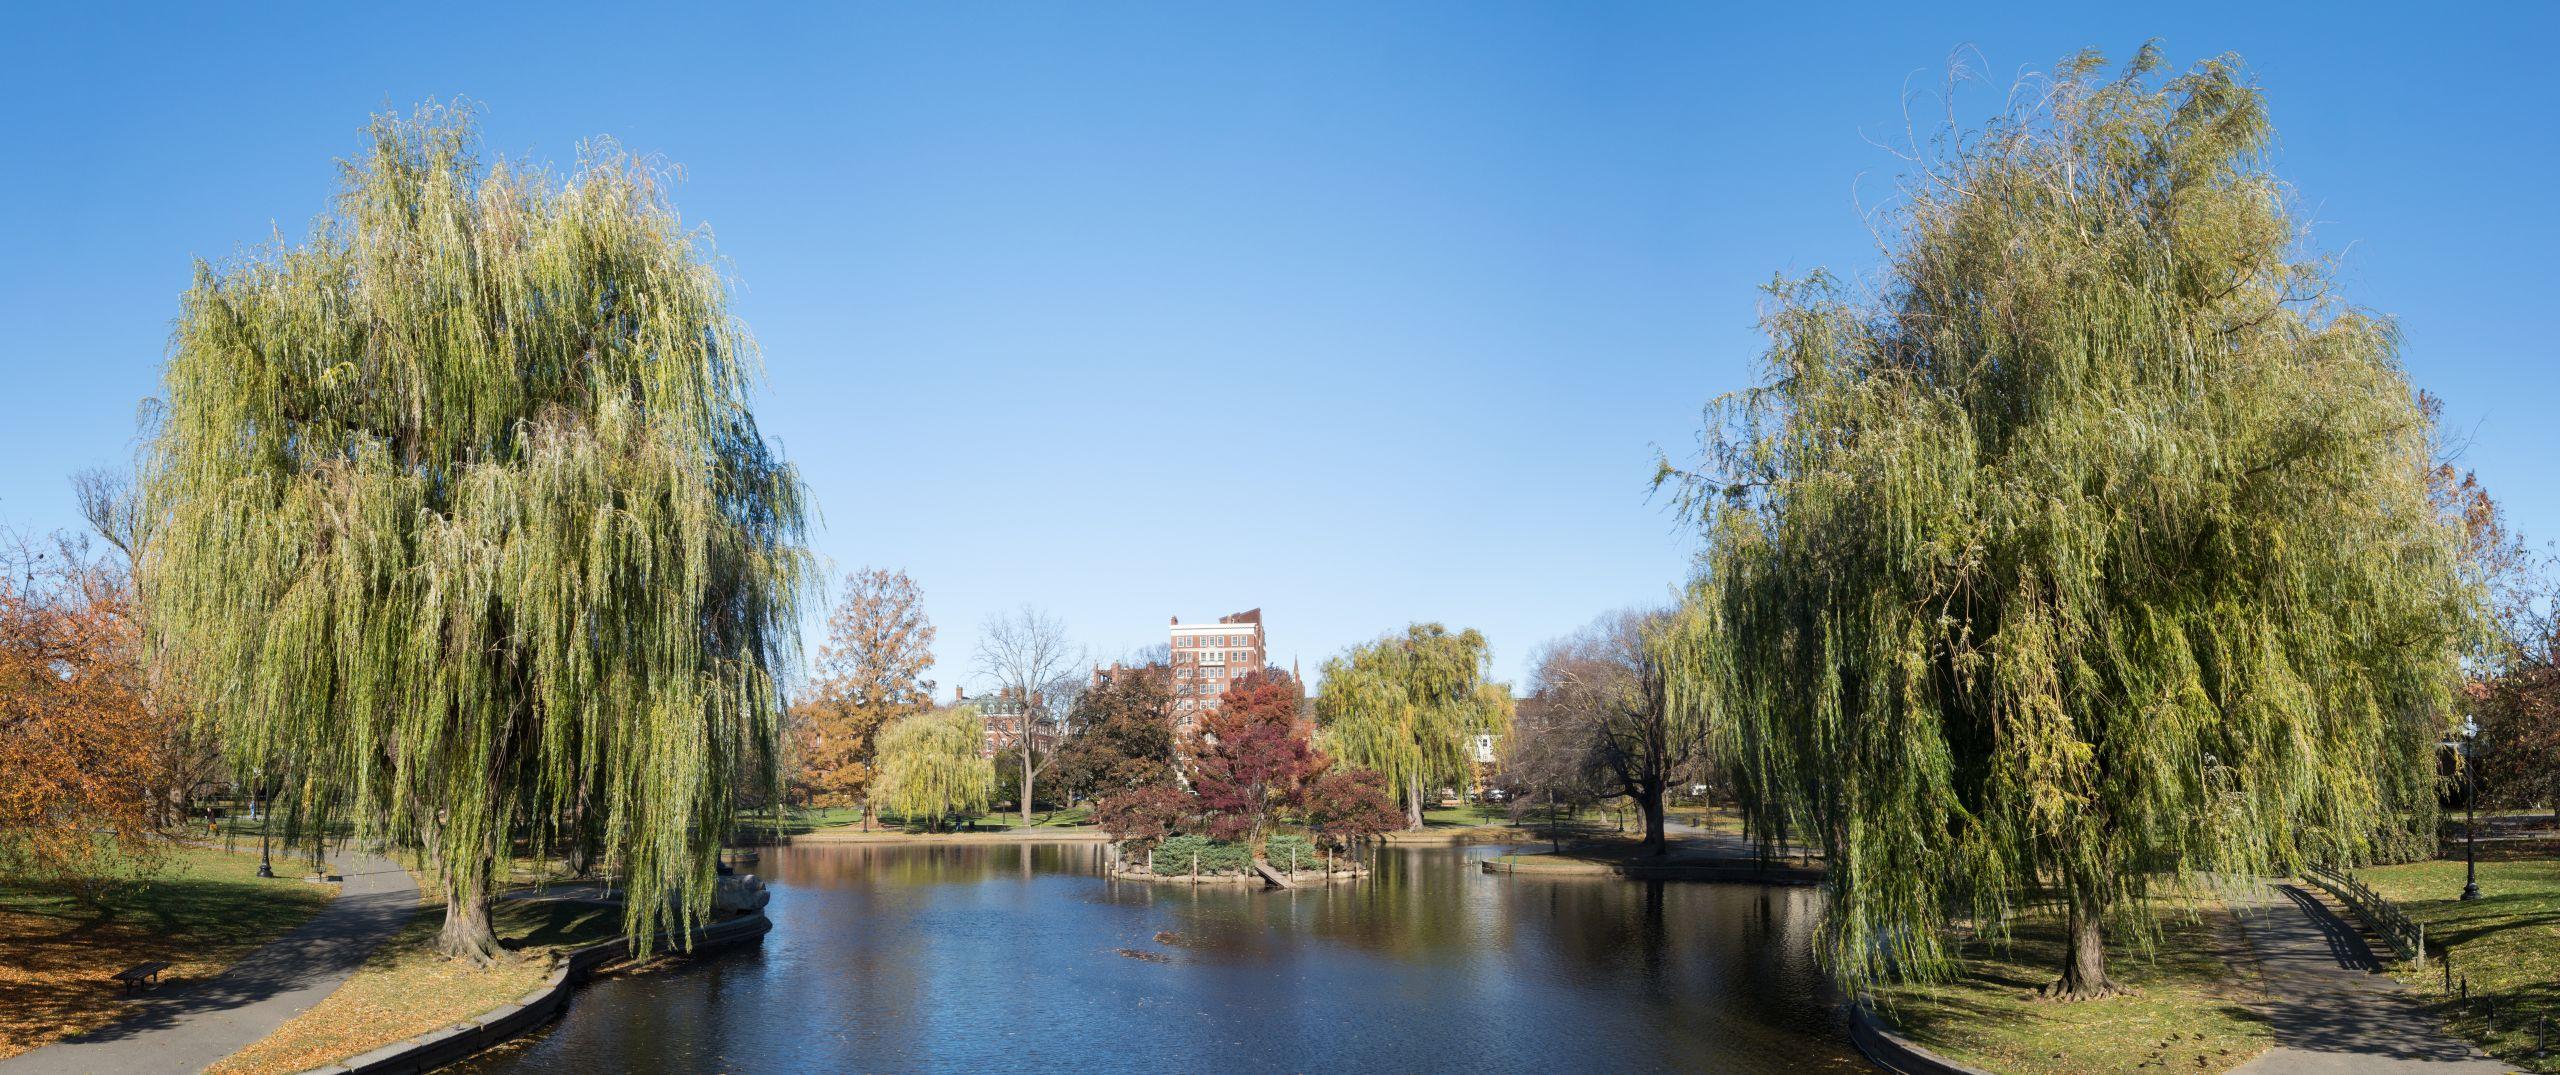 Boston Public Garden % p